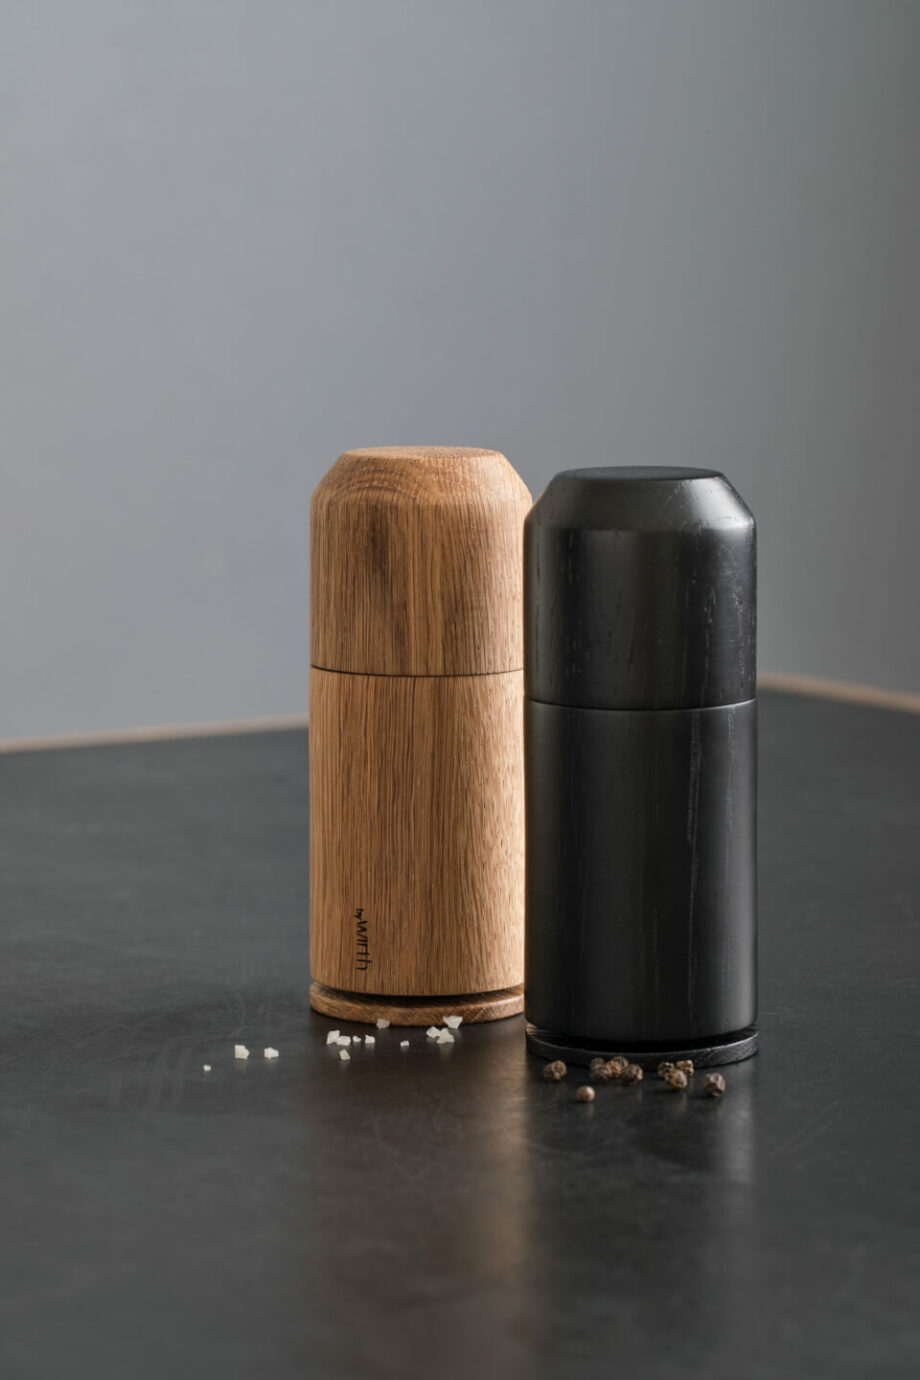 by Wirth kruidenmolen Crush Me houten zoutmolen pepermolen zwart eikenhout